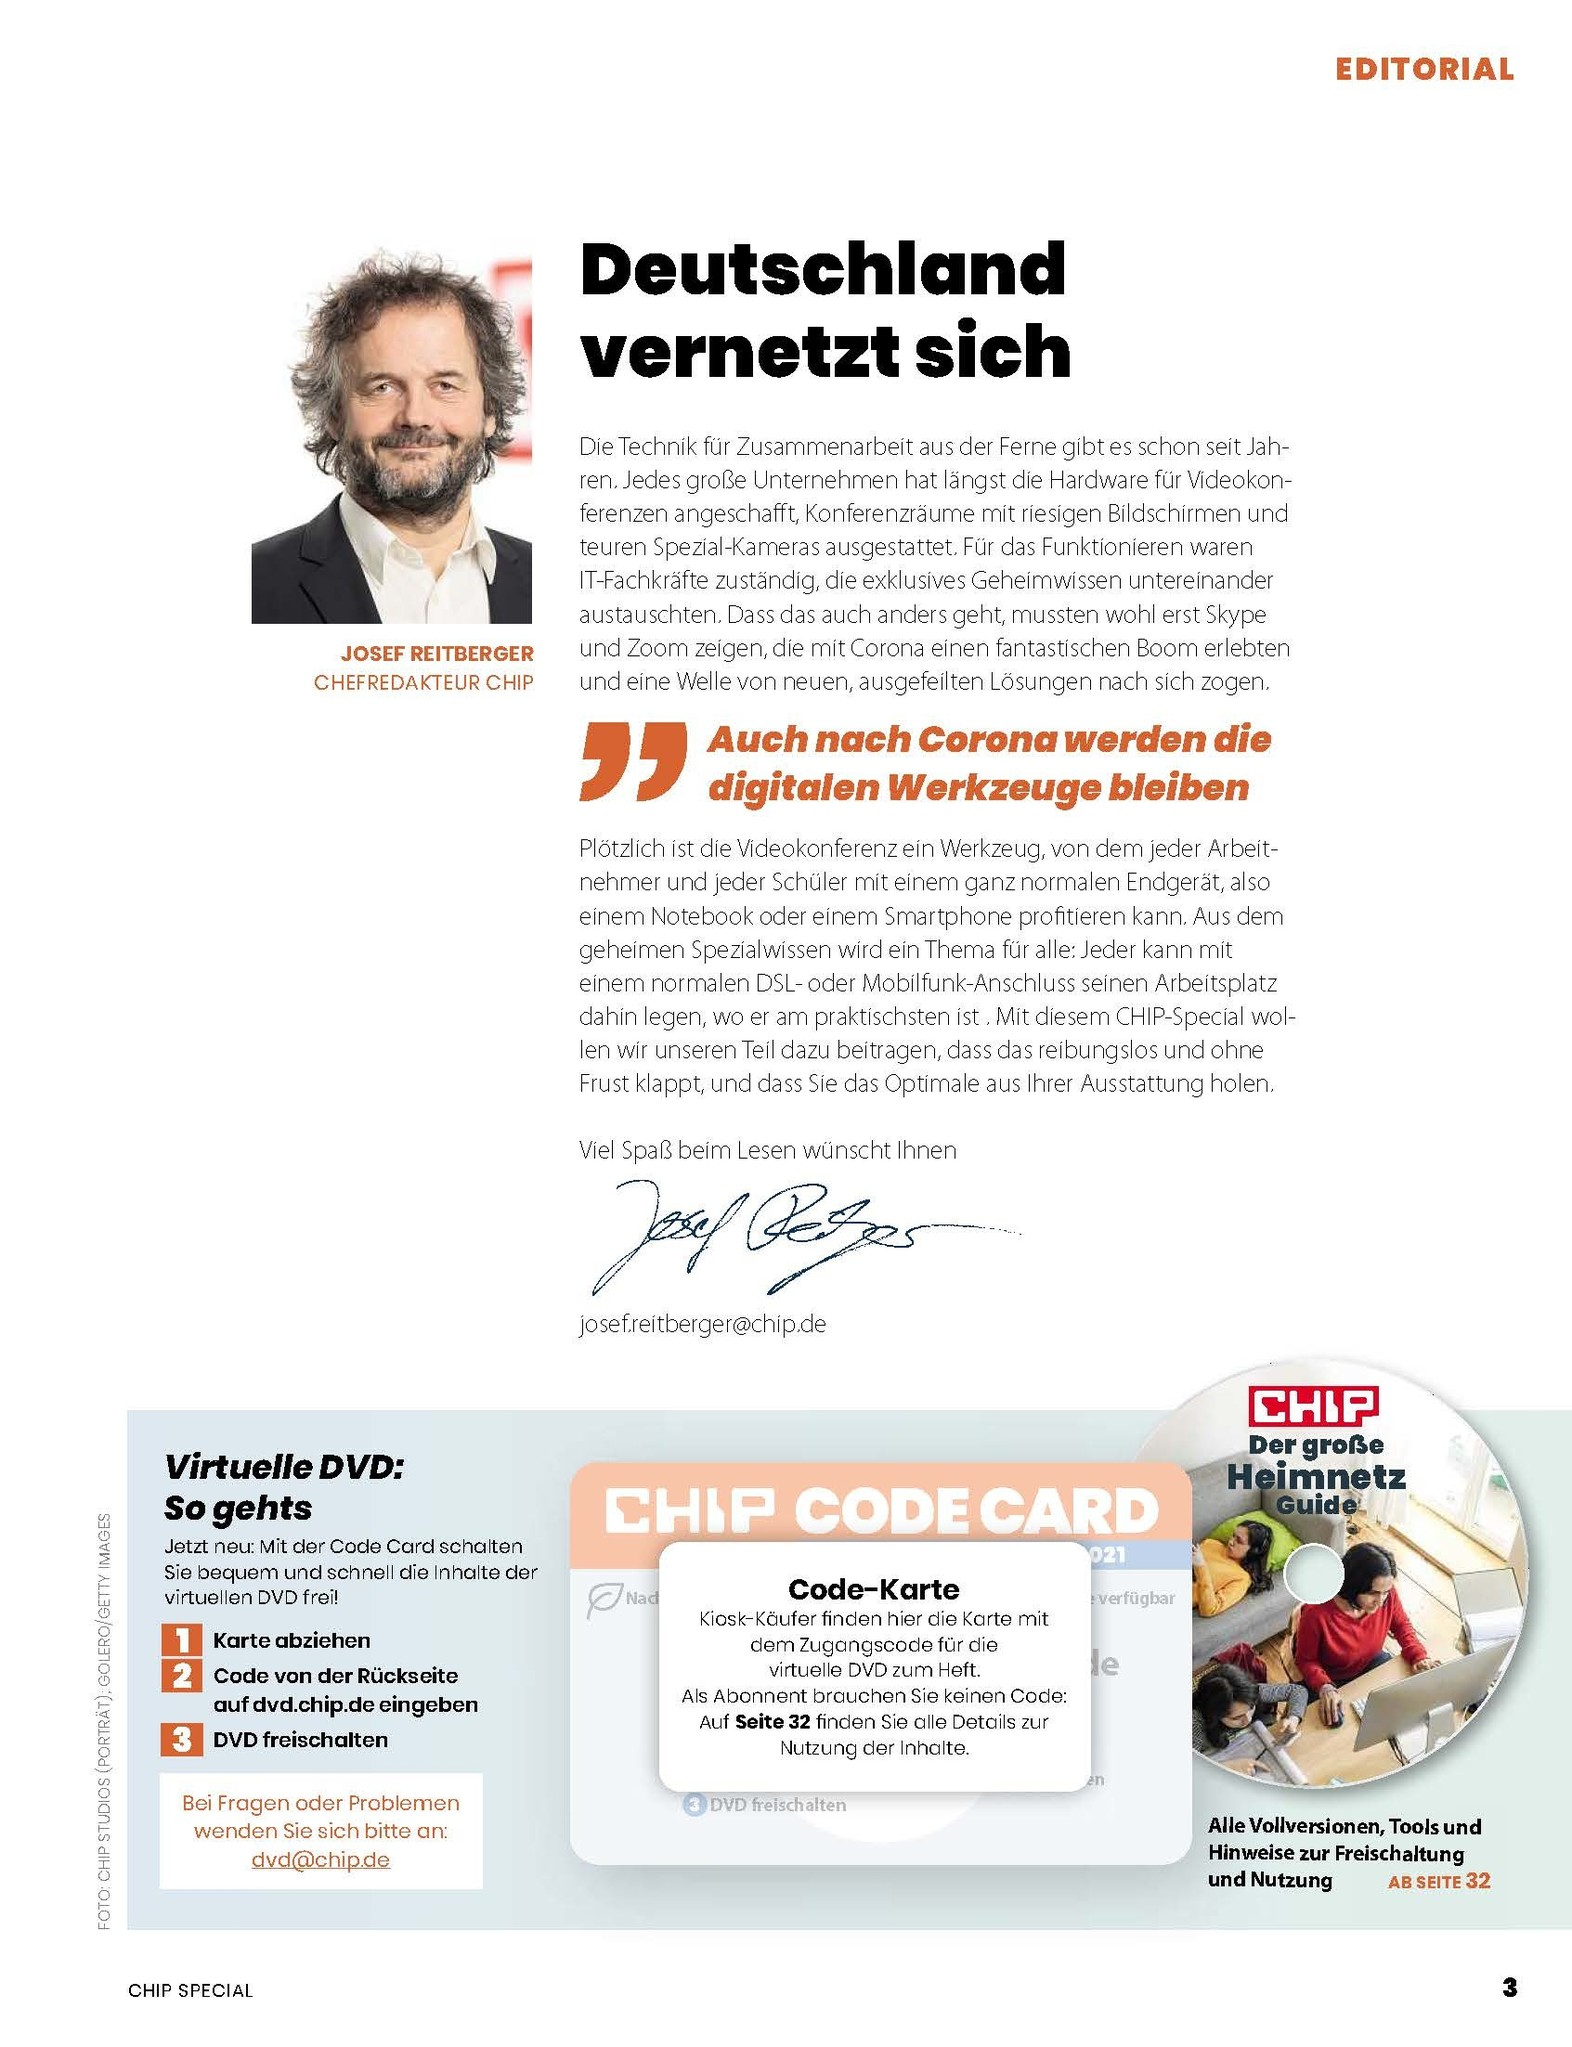 CHIP CHIP Special – Der große Heimnetz-Guide 2021